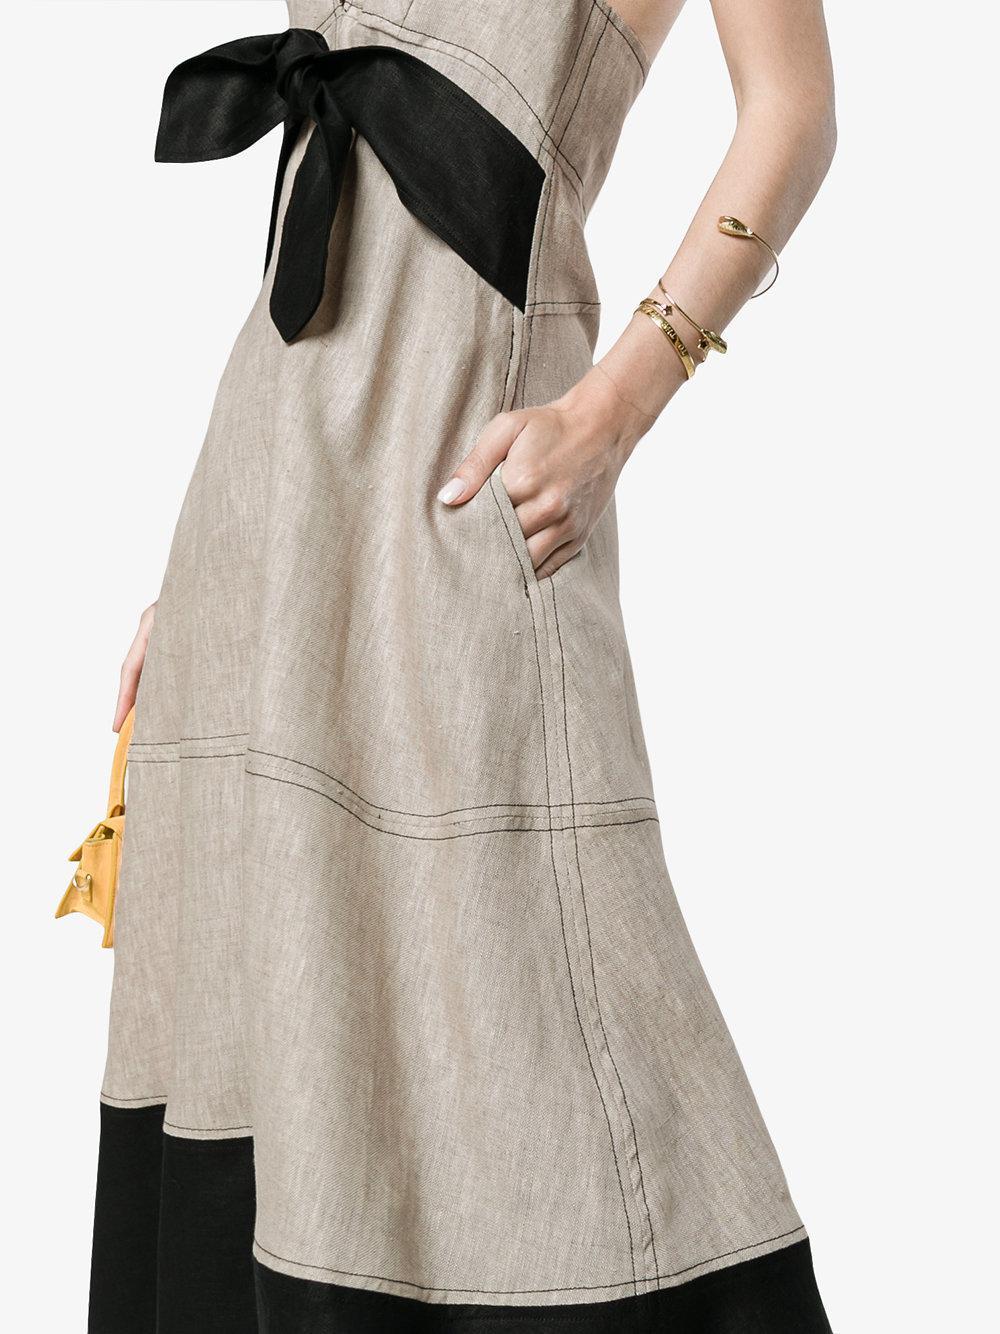 Coral Maxi Dress - Nude & Neutrals Paper London UPULbAY1